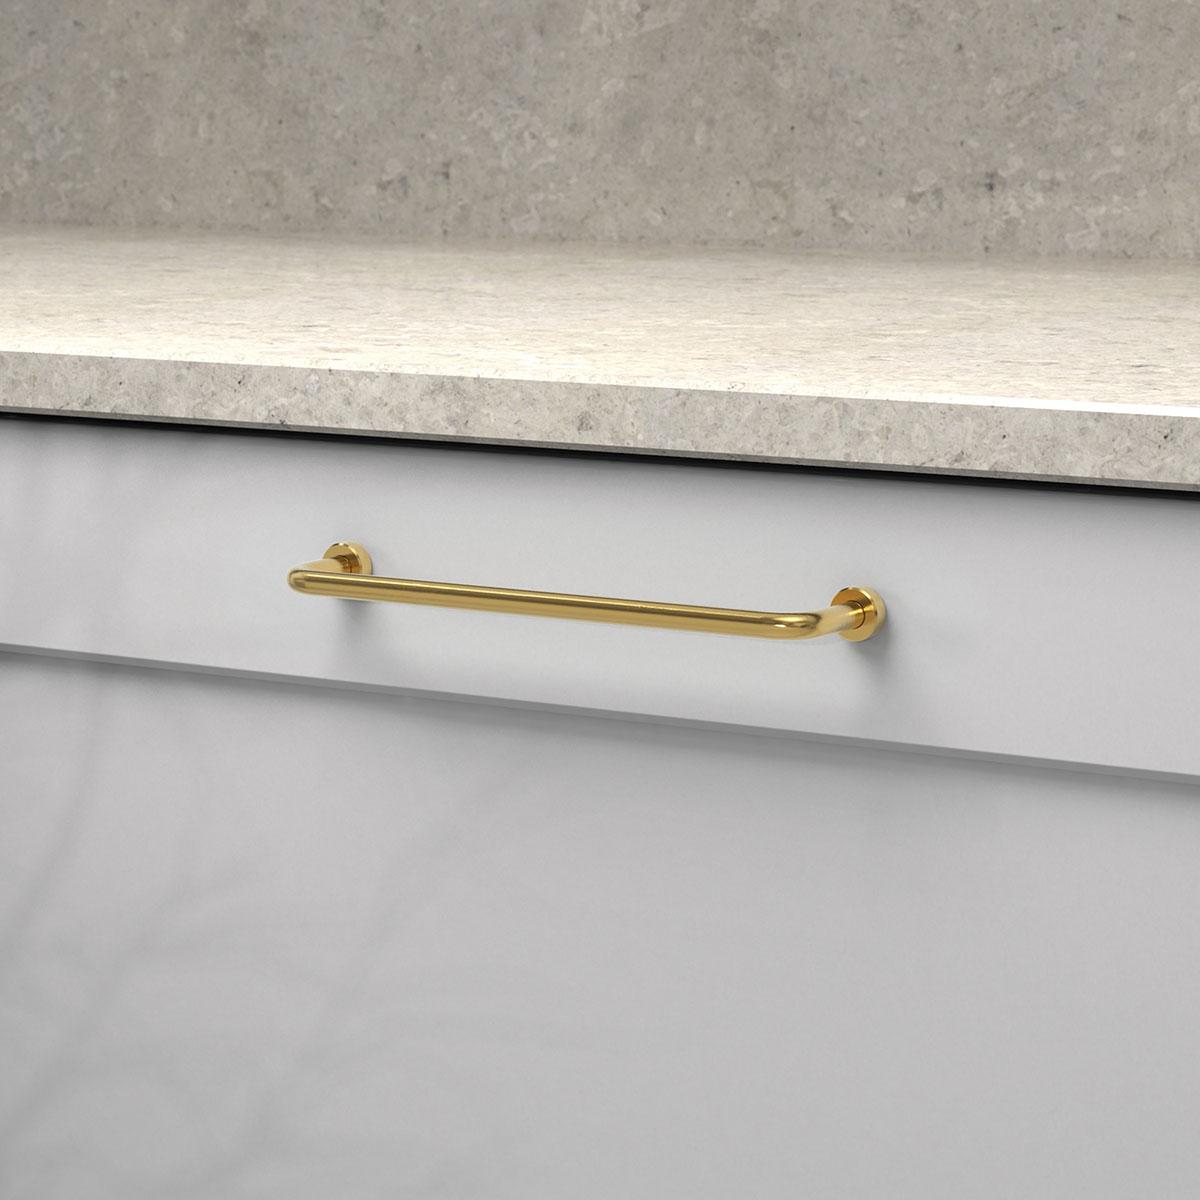 Handtag lounge polerad massing 370121 11 cc 160 mm ncs s 3000 n kalksten